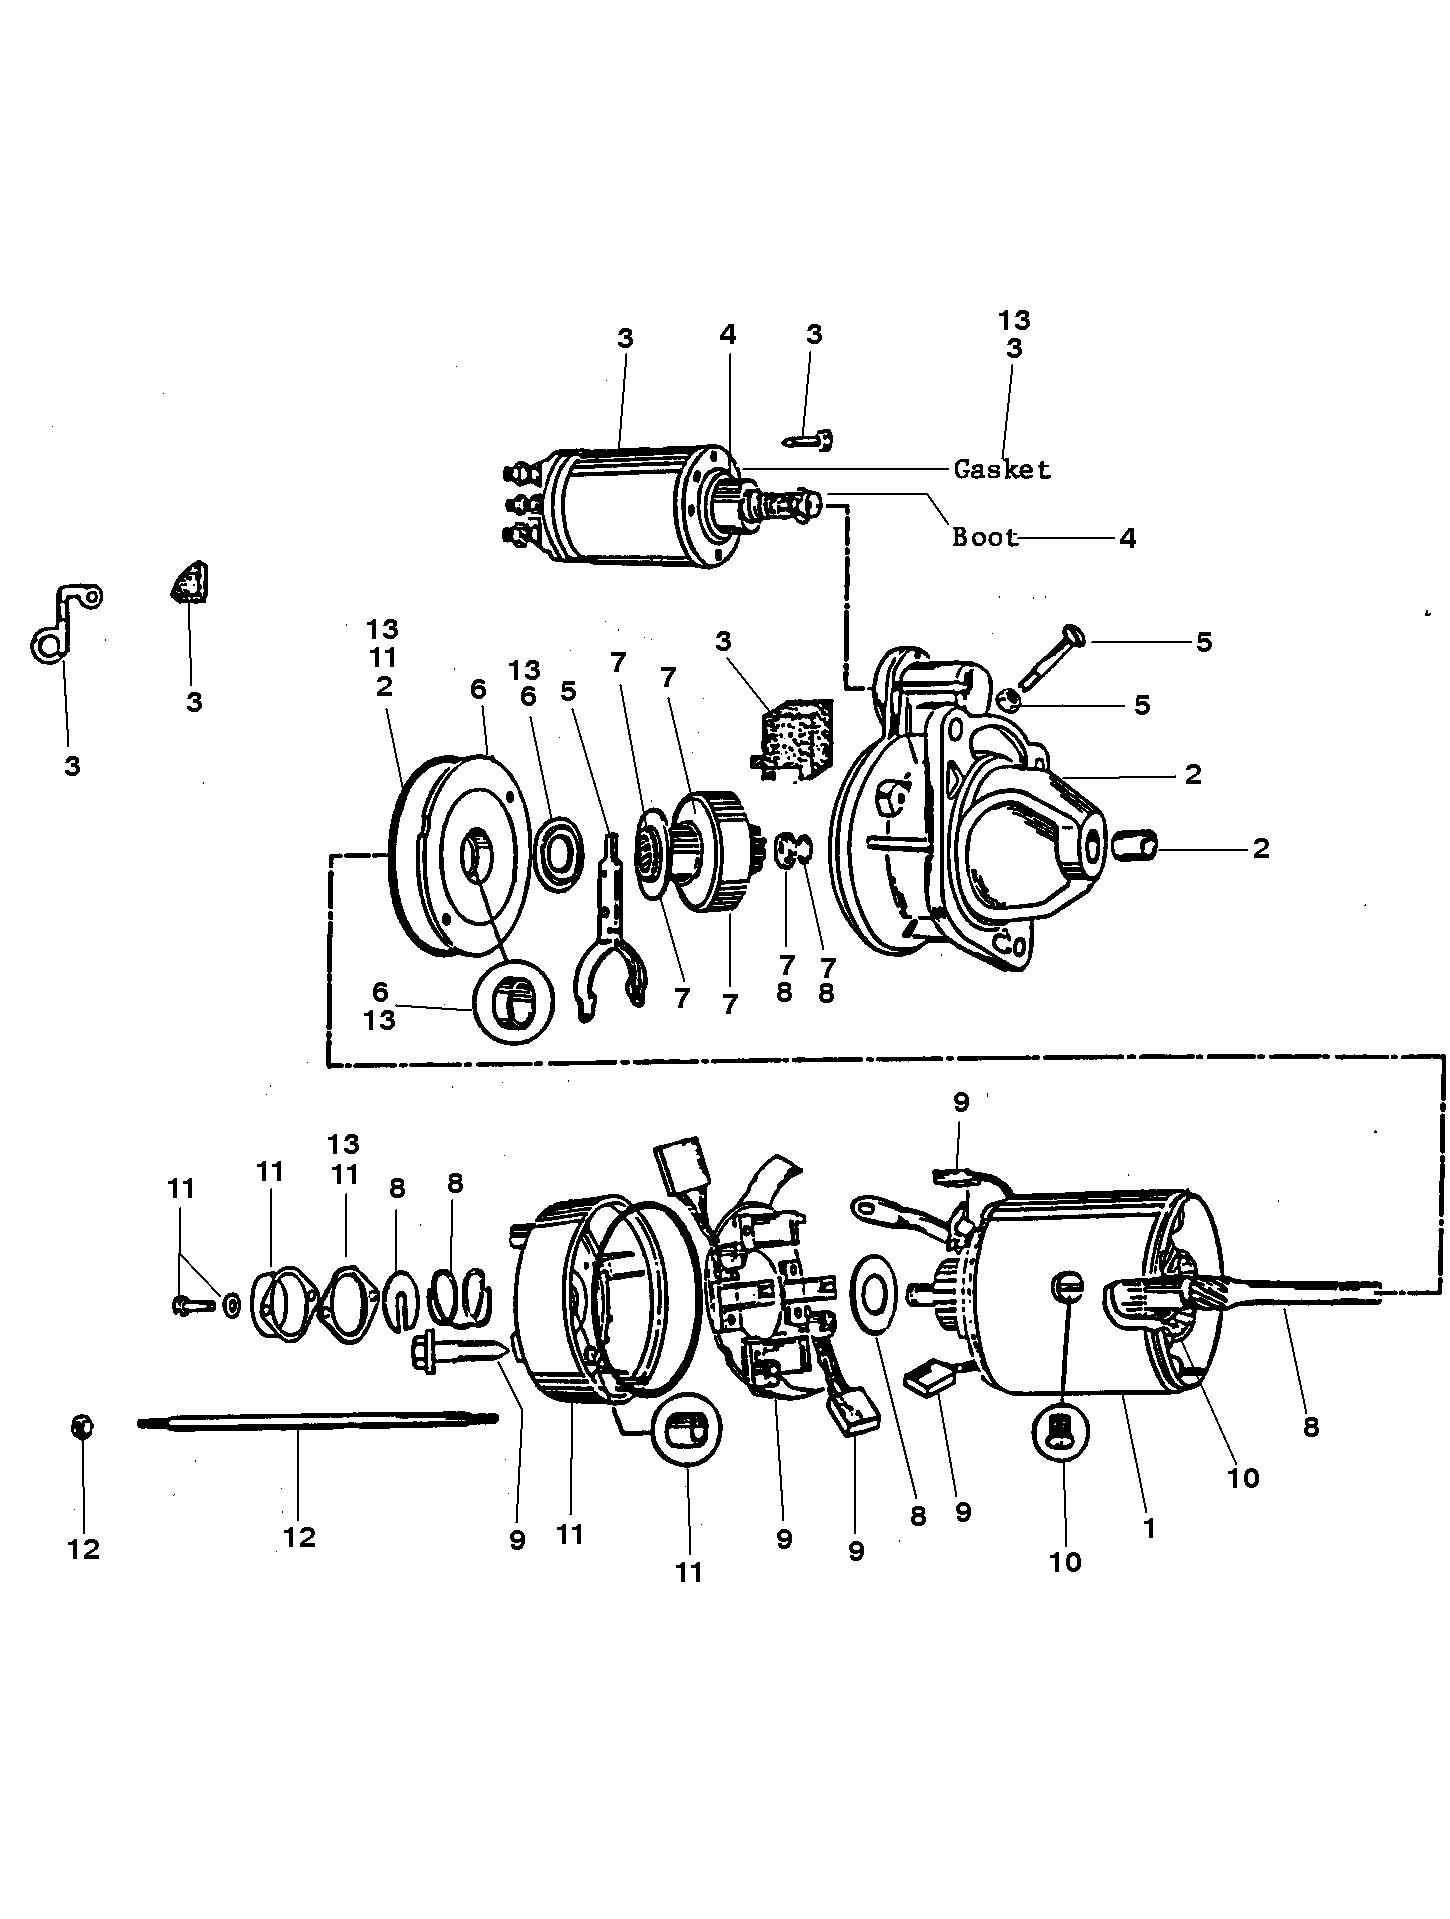 525 sc (gen 5) gm 454 v-8 1996 - serial 0f615814 thru 0f745215 - starter  assembly (50-808011a1)